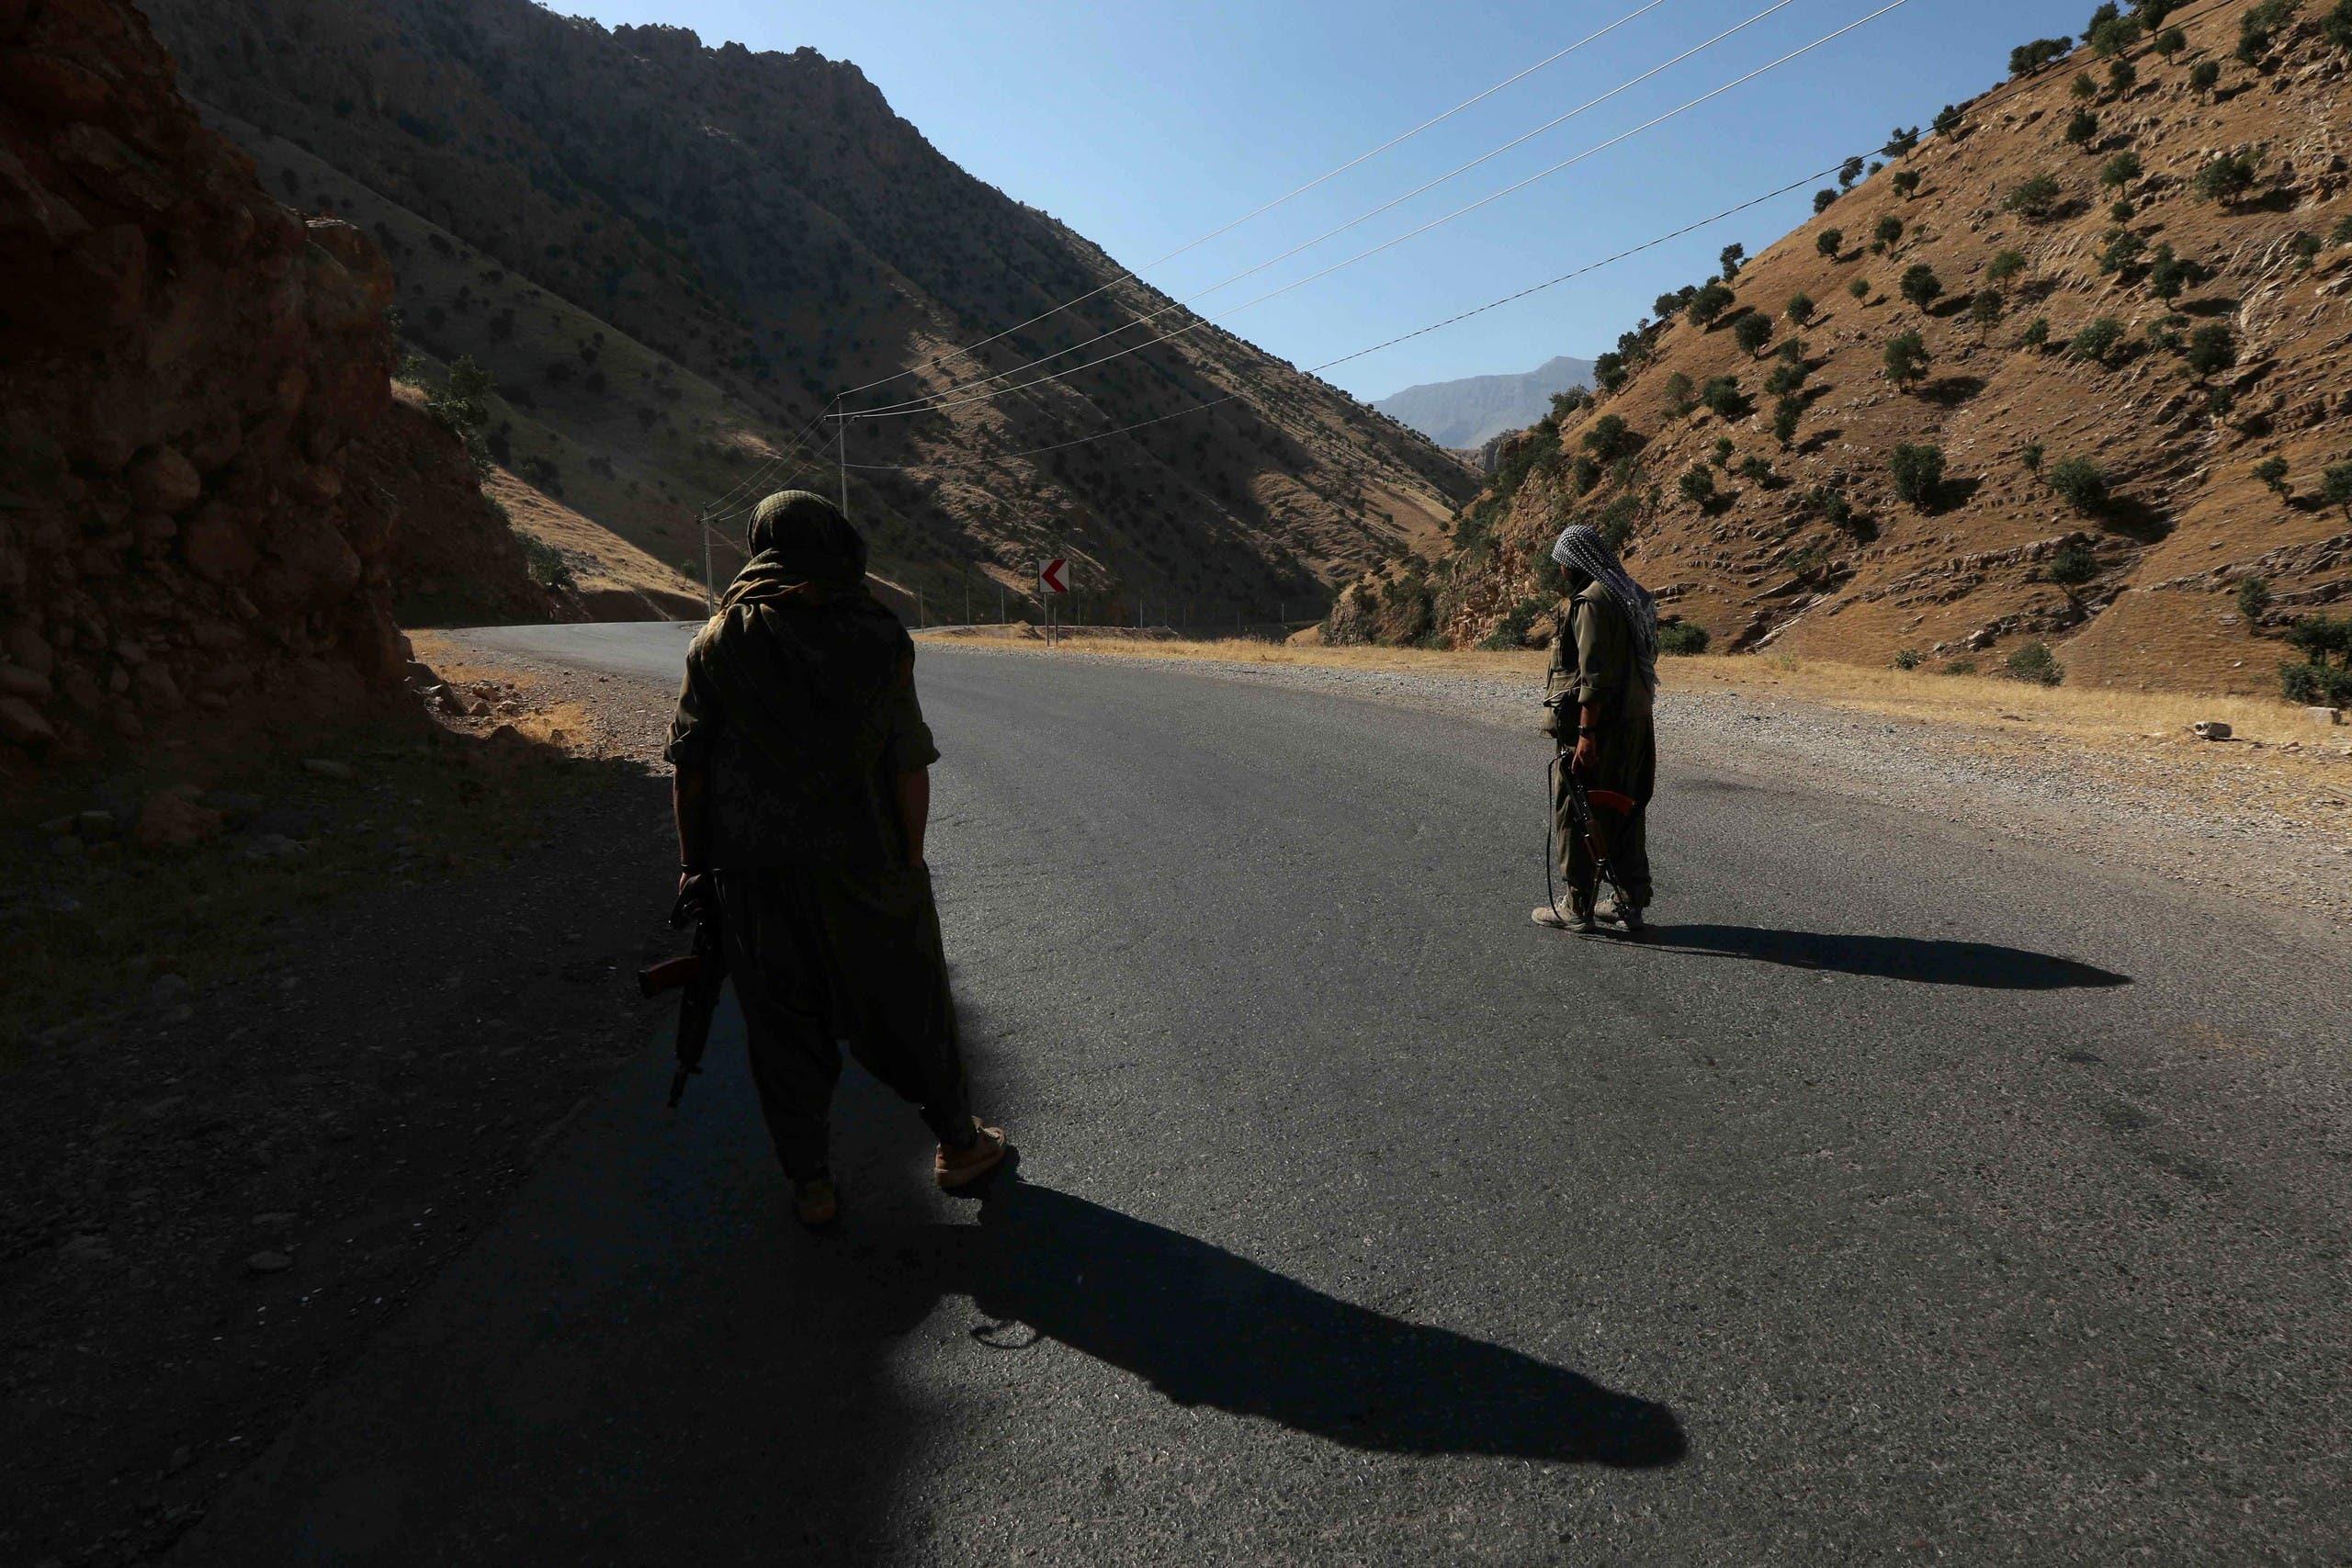 A member of the Kurdistan Workers' Party (PKK) on the road in Iraqi Kurdistan.